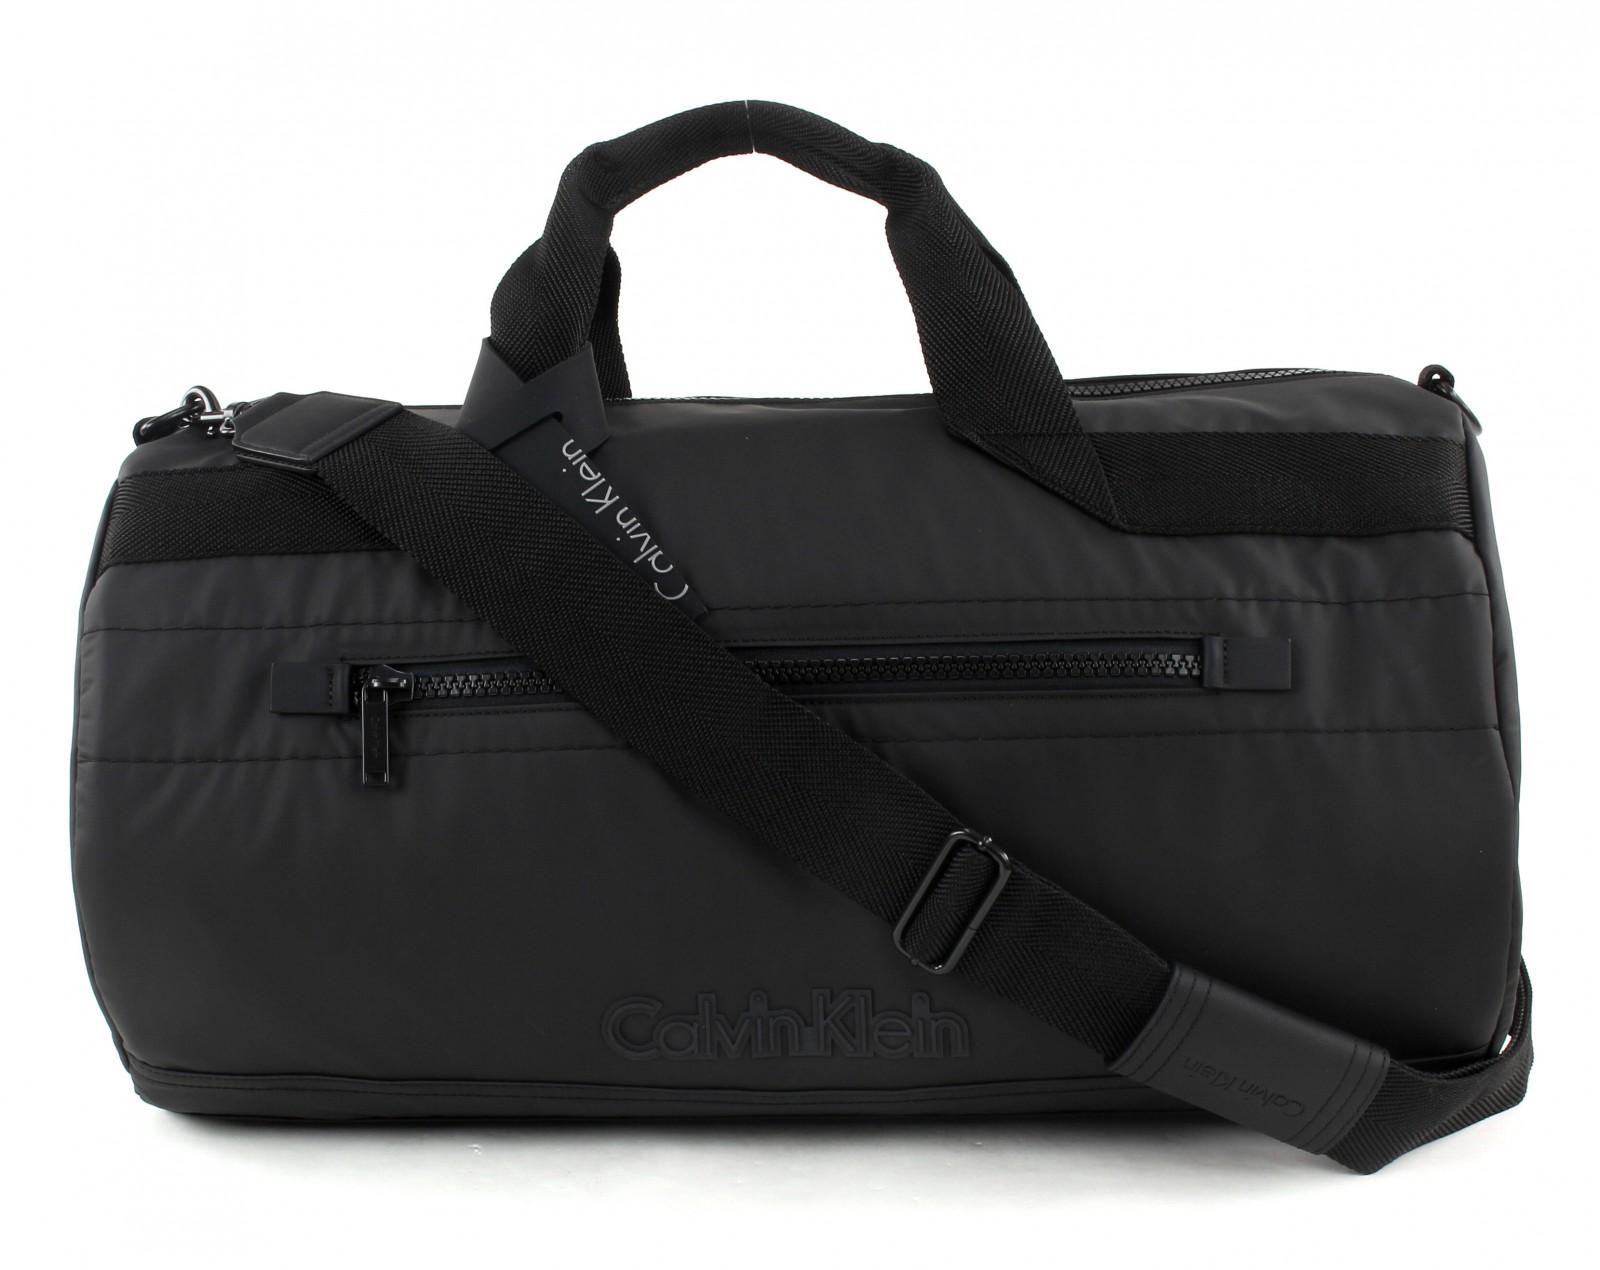 calvin klein sac de voyage metro weekender black ebay. Black Bedroom Furniture Sets. Home Design Ideas